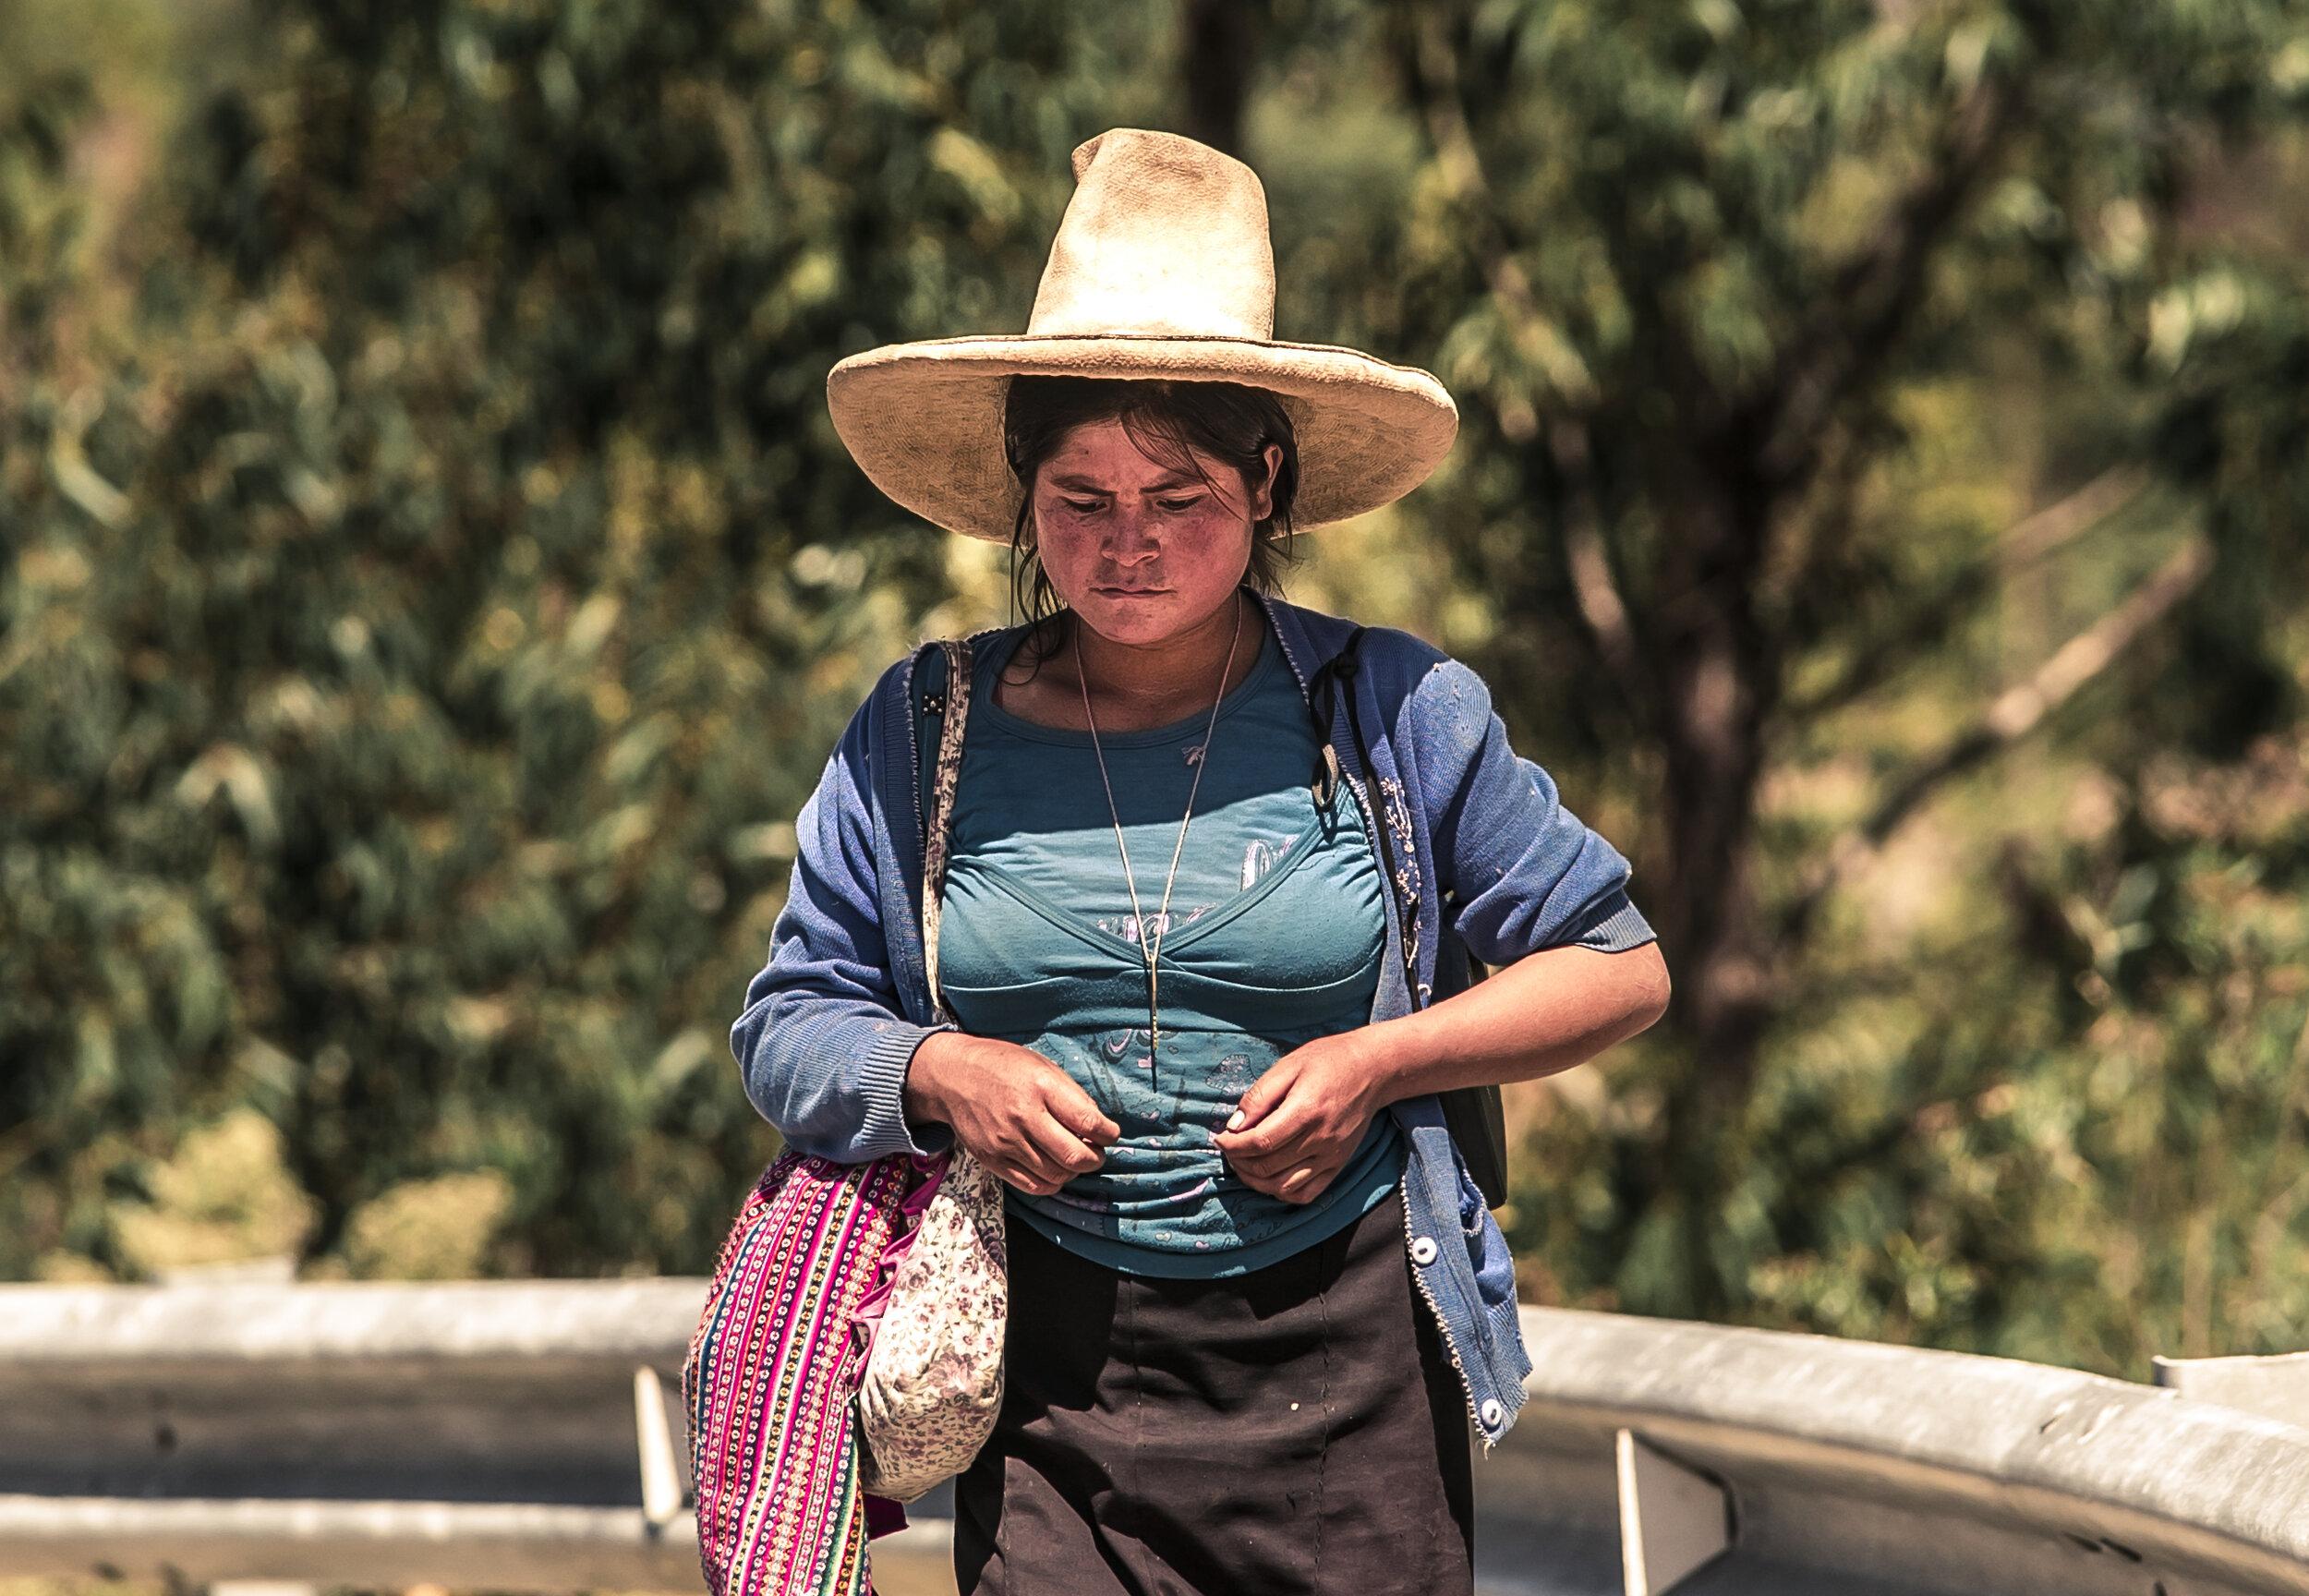 goat herder lady cropeedl.jpg